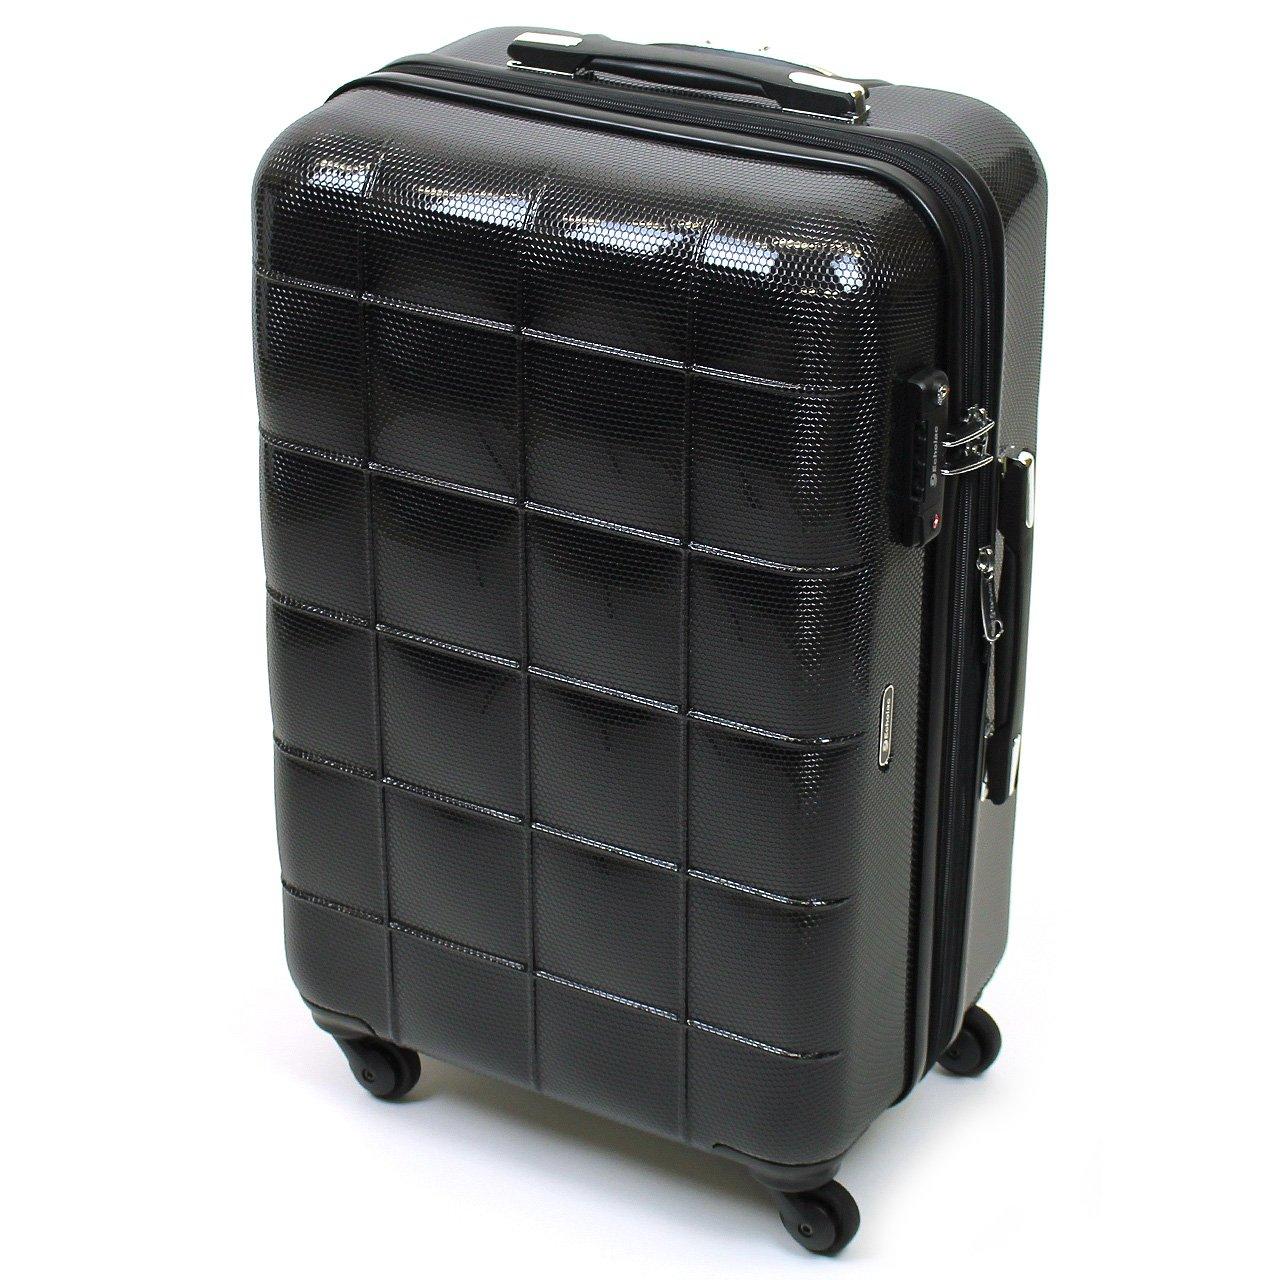 [Echolac(エコーラック)] スーツケース スクエア 60+9L 59.5cm 4kg PC005-24  ブラック B07F2HQG14